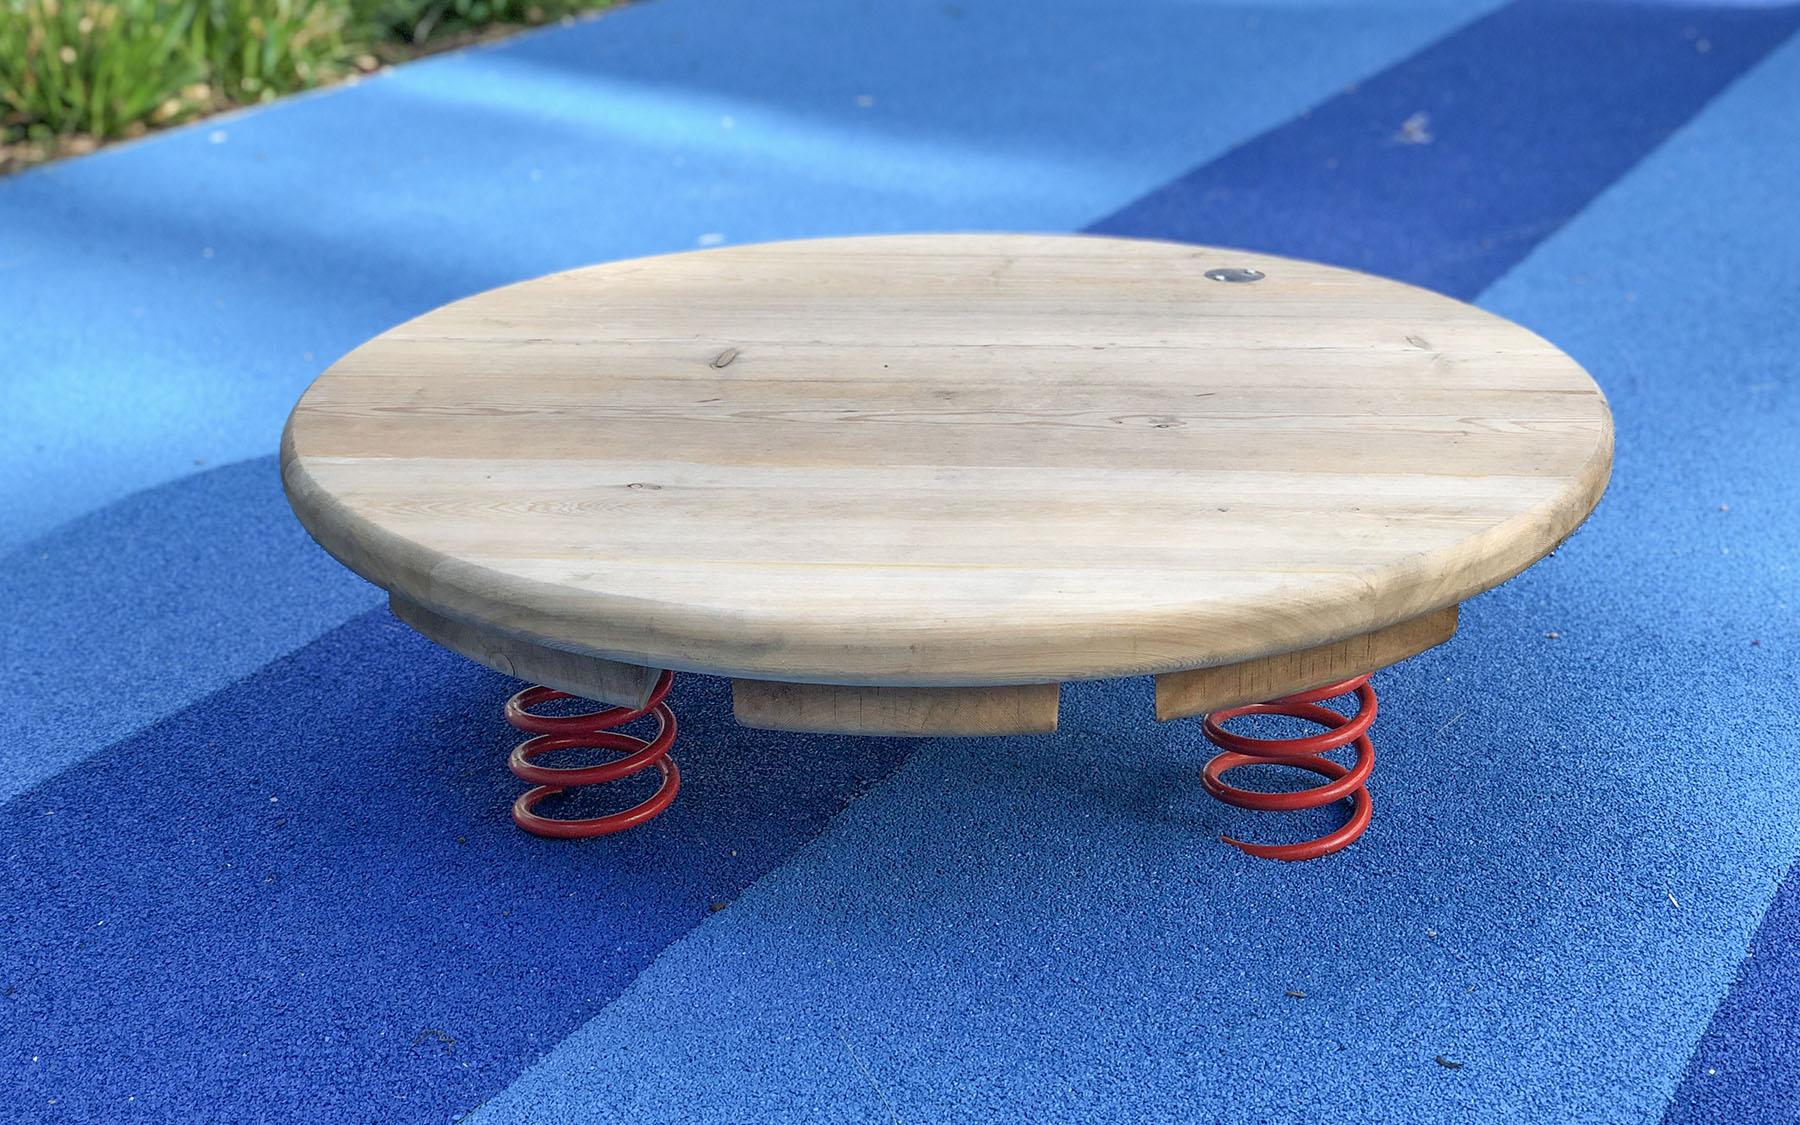 playground equipment jumping discs